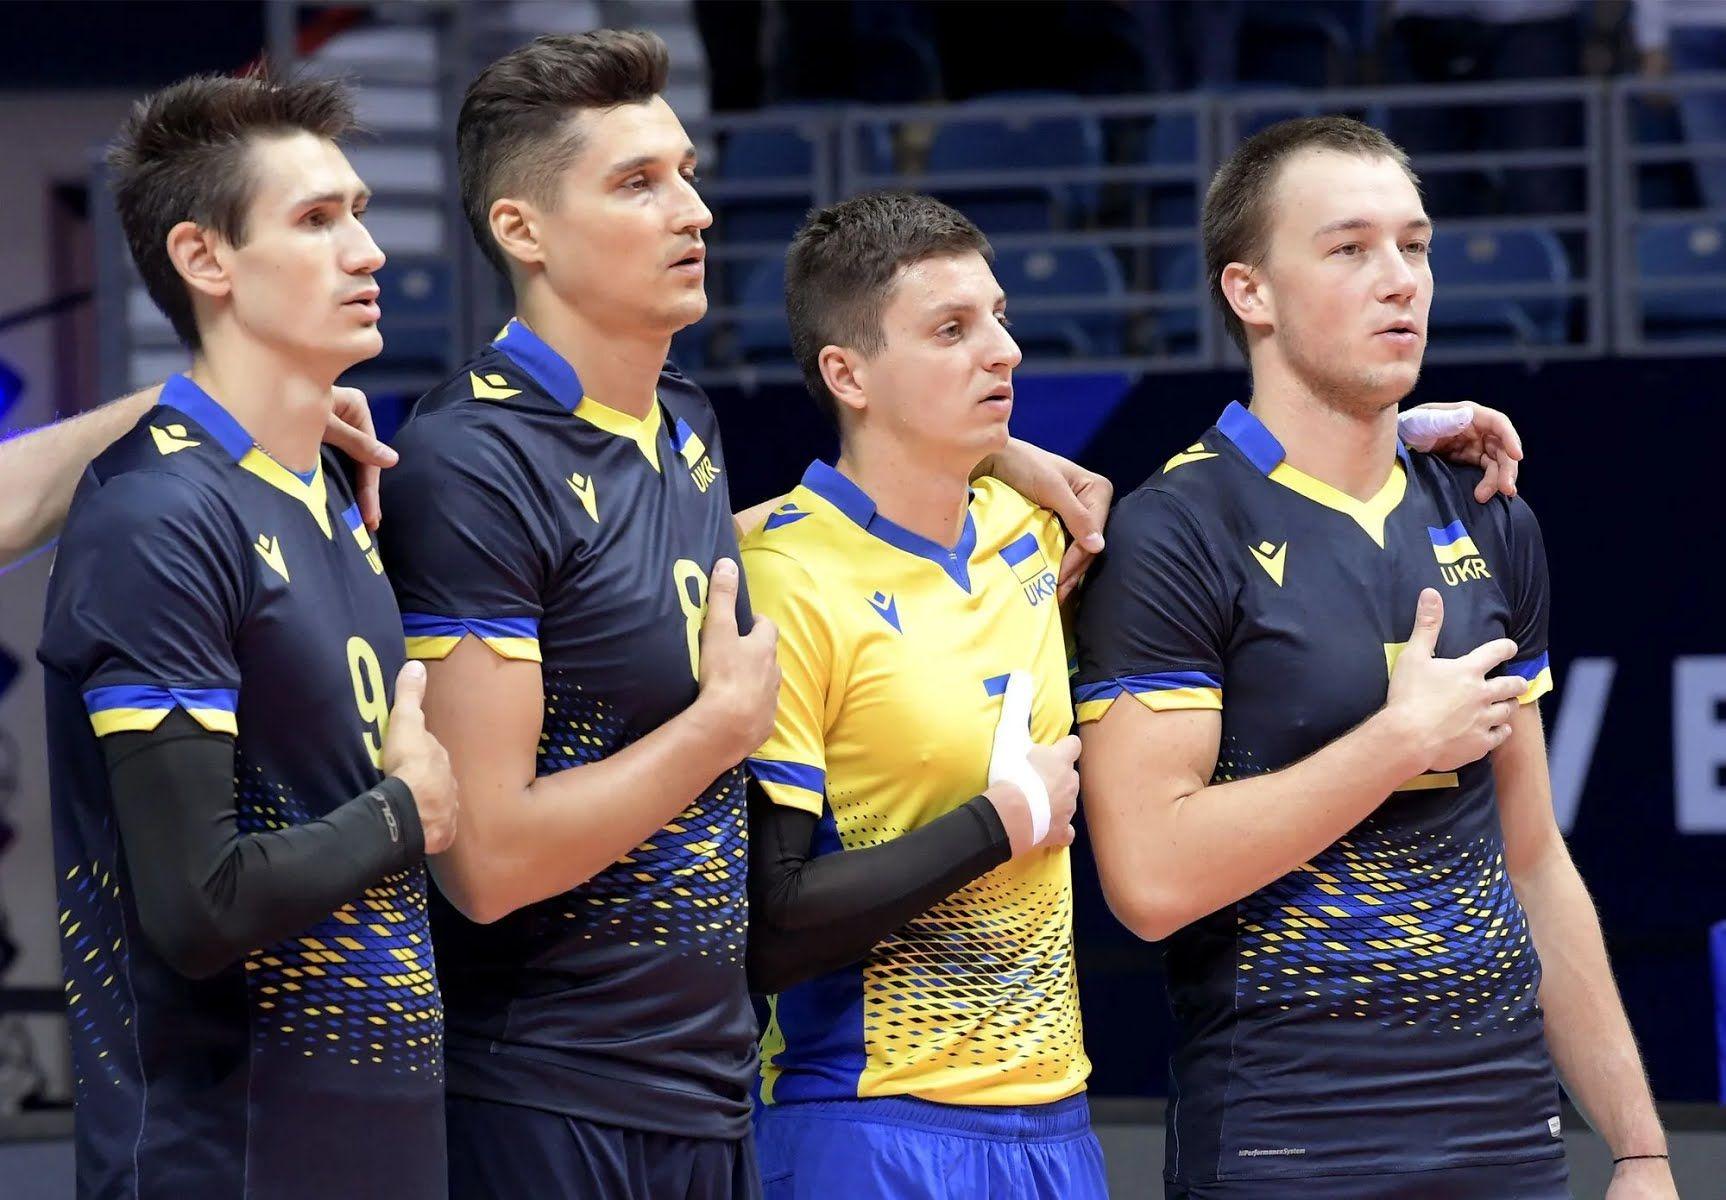 Украинцы исполняют гимн страны.